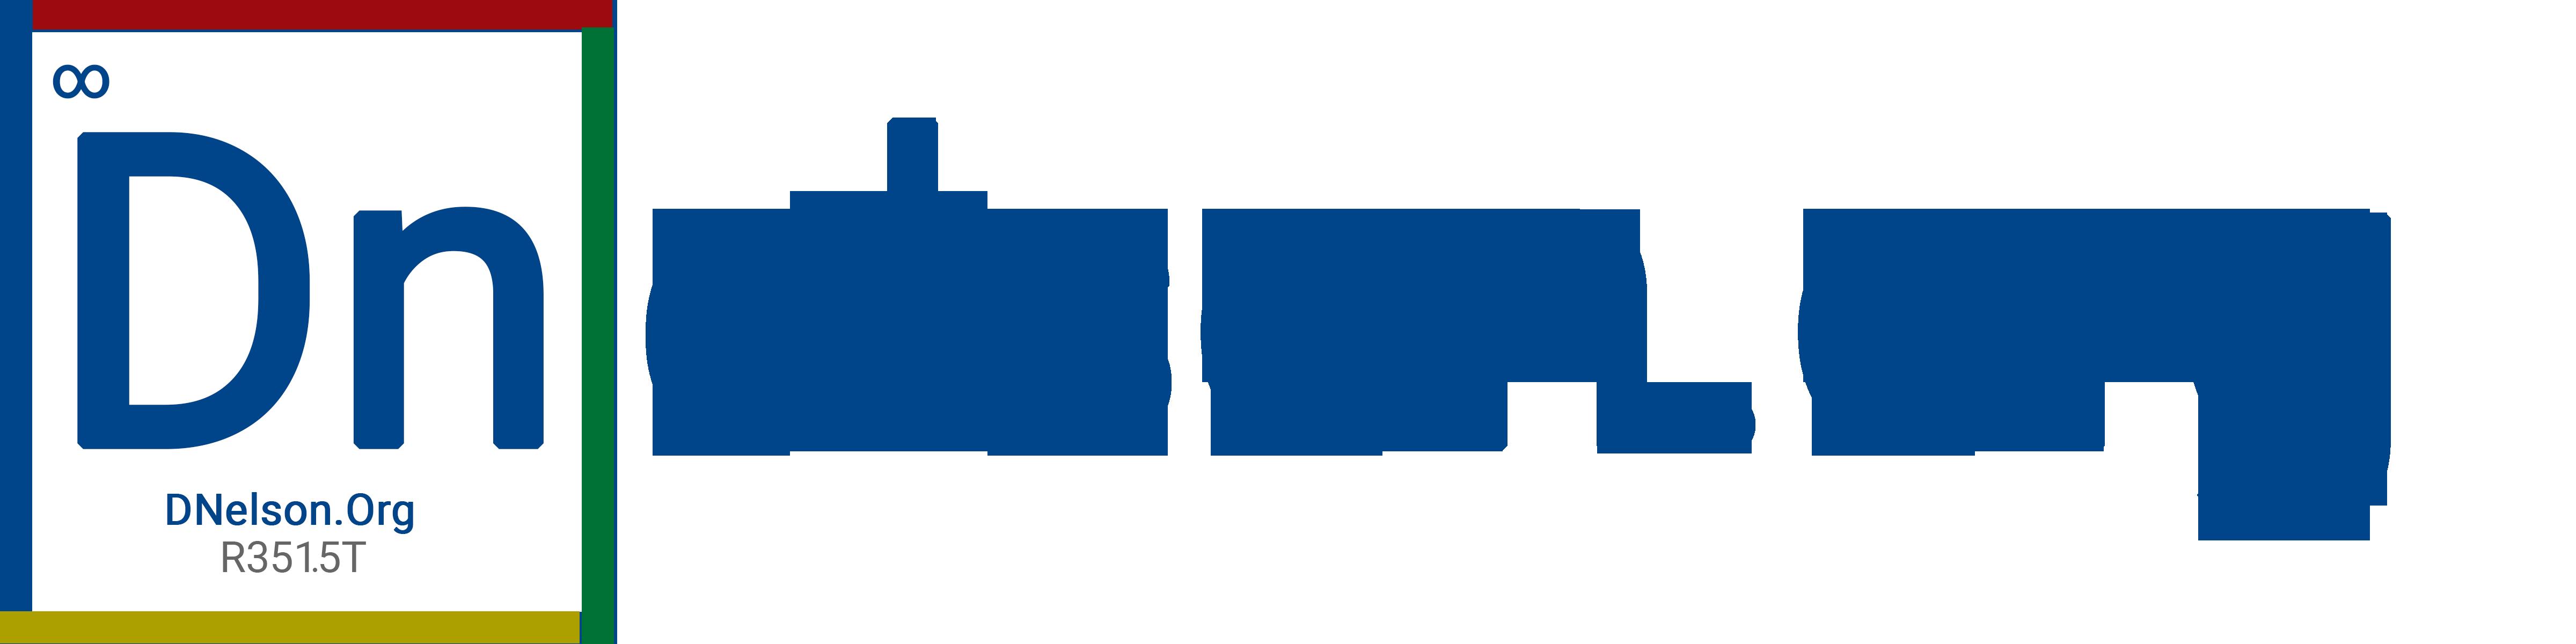 DNelson.org